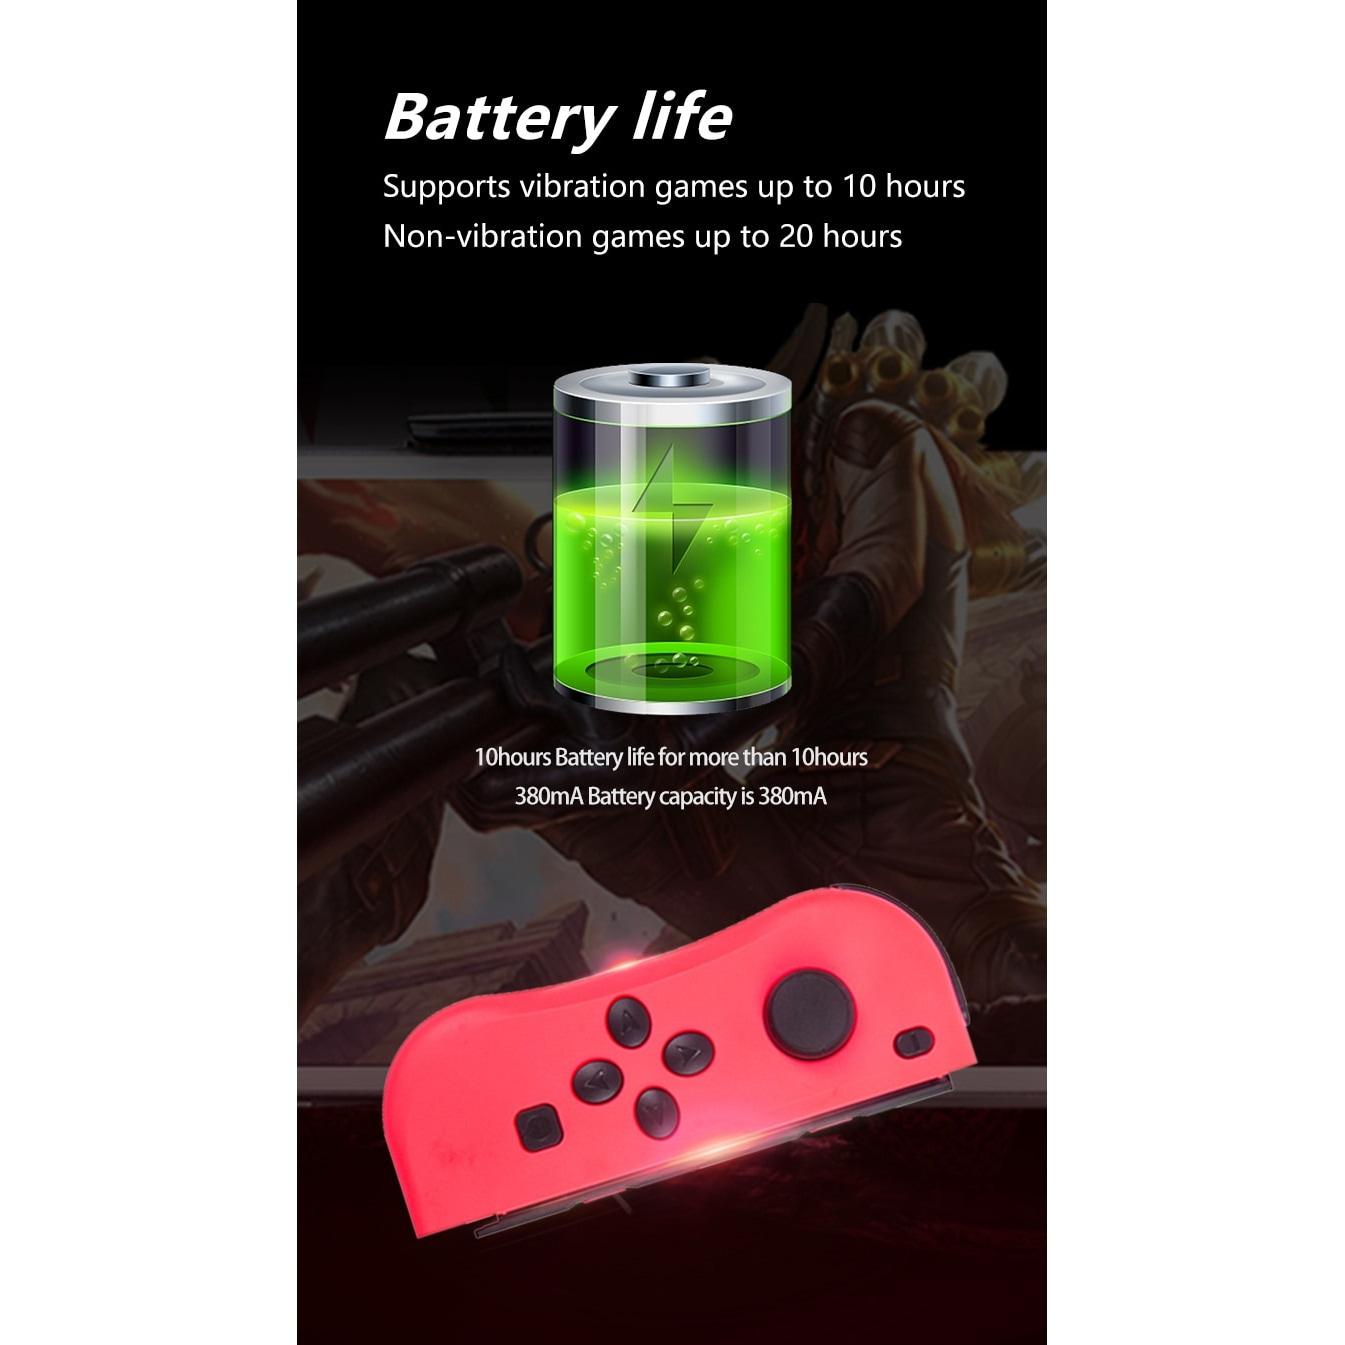 Wireless Joysticks for Nintendo Switch (L and R) Blue - 4